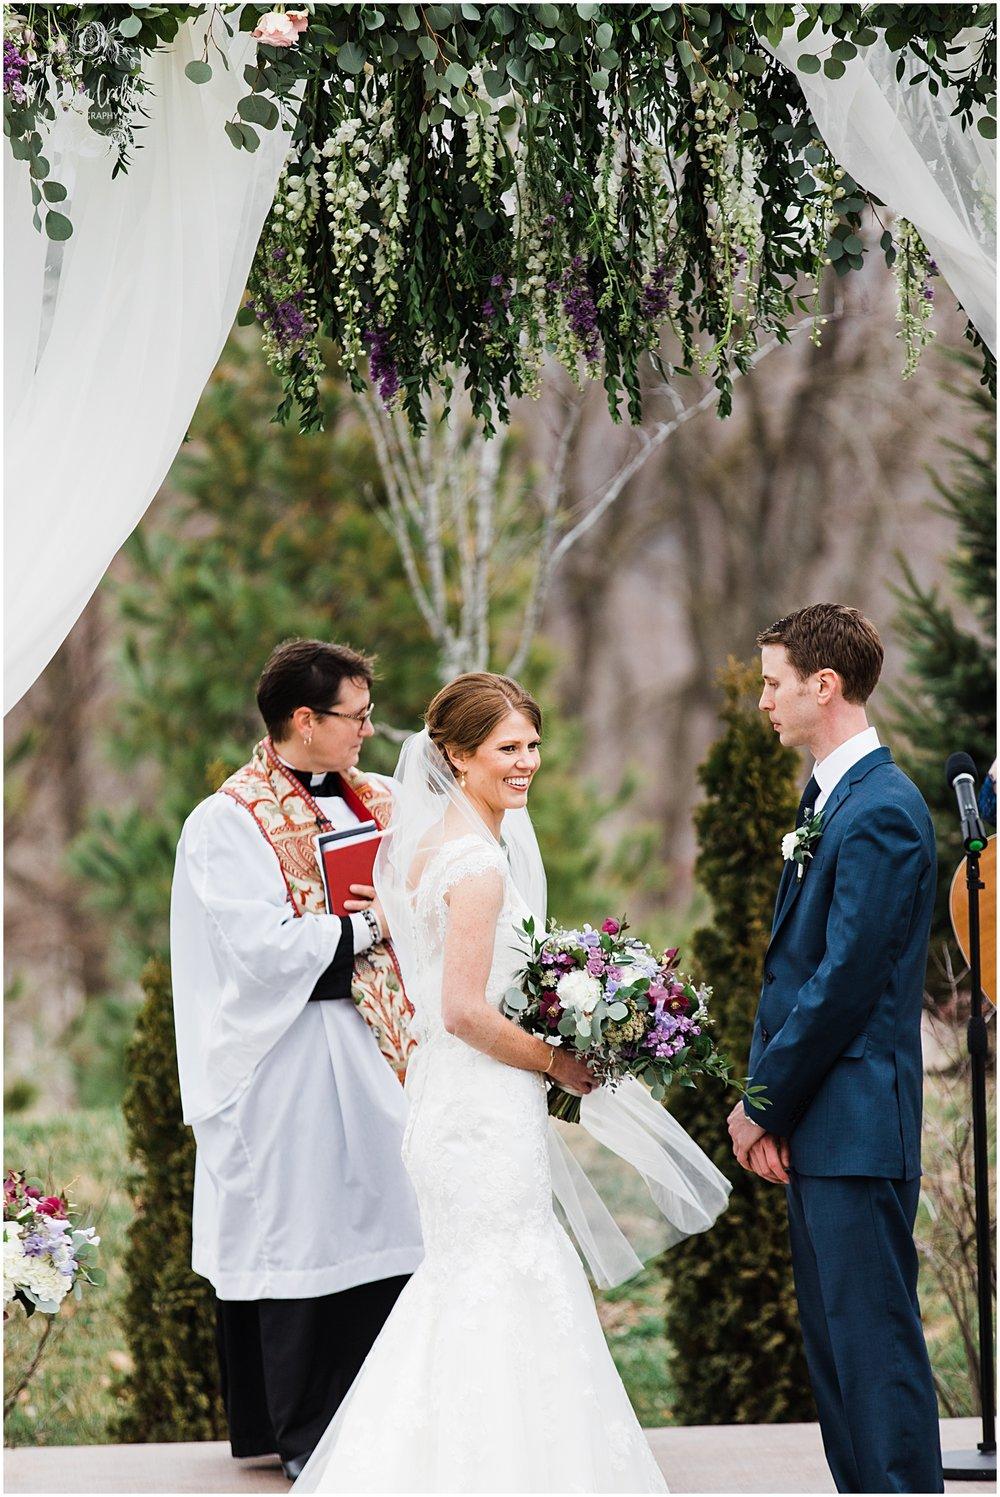 JACOBI WEDDING | 1890 EVENT SPACE | MARISSA CRIBBS PHOTOGRAPHY_4315.jpg